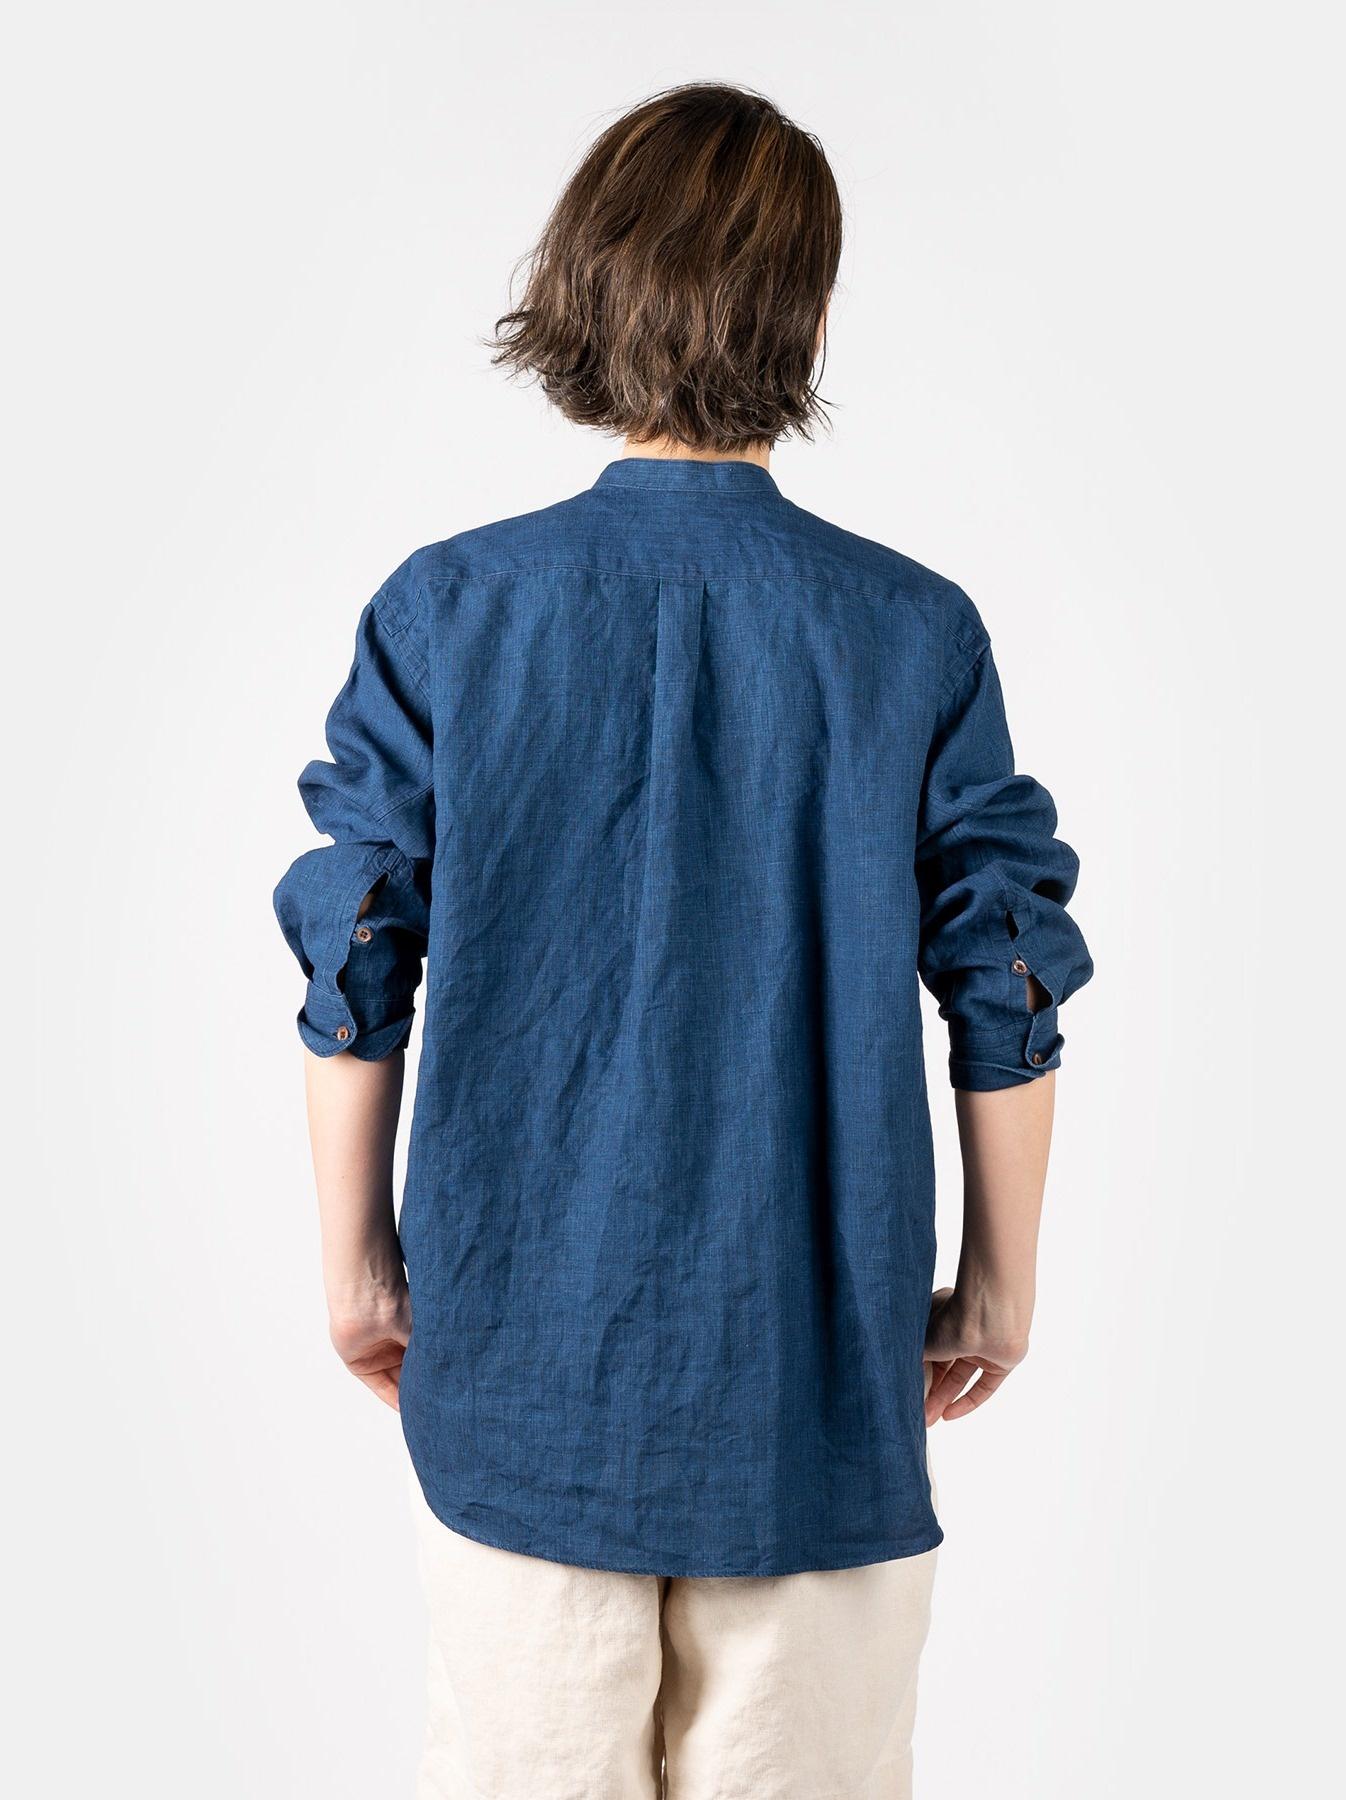 WH Indigo Linen Pin-tuck 908 Shirt-7